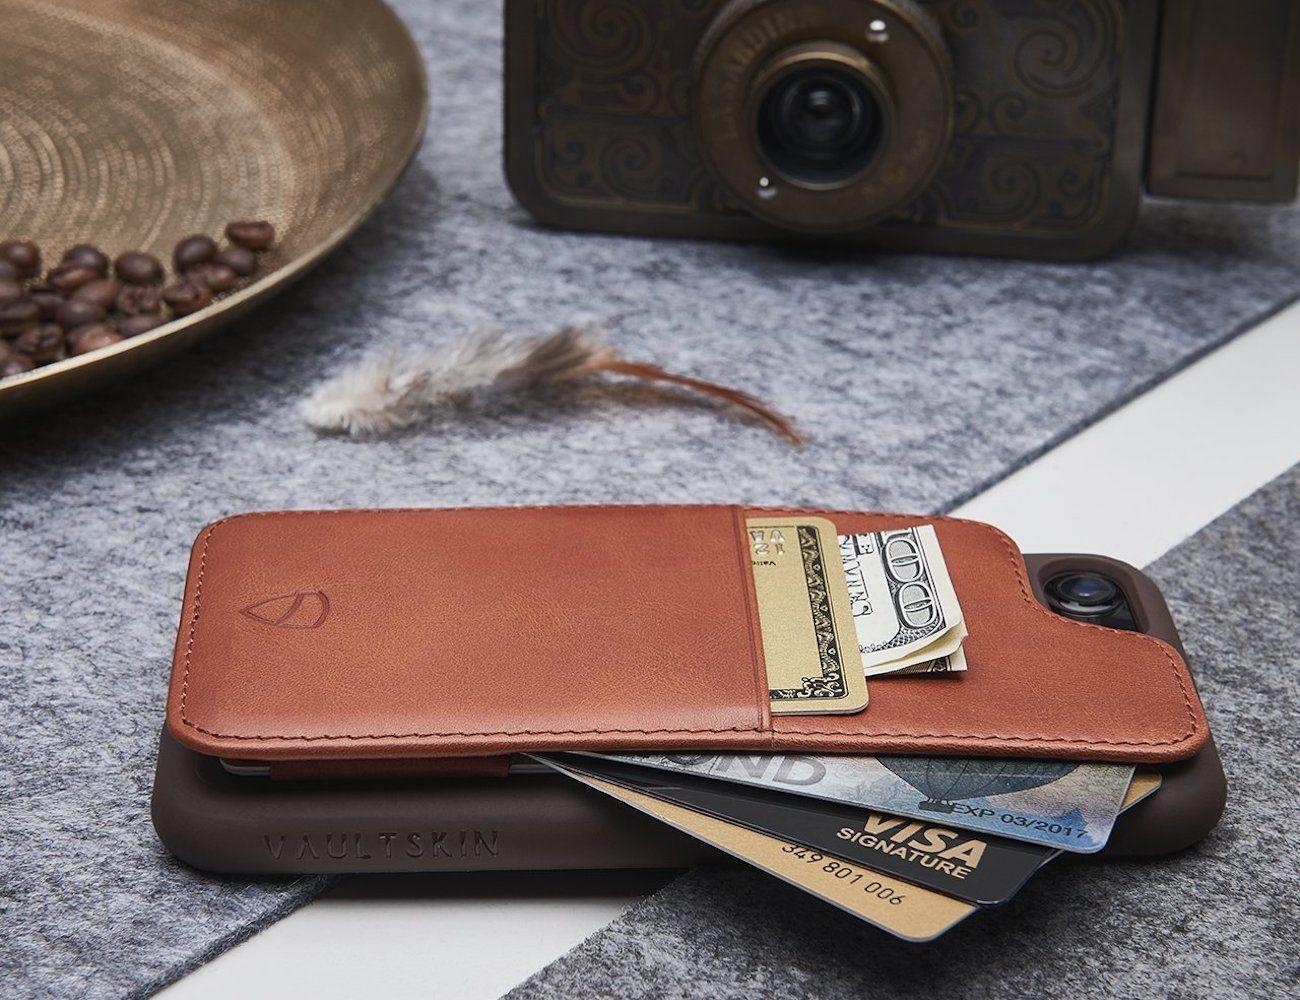 Eton Armour iPhone 7 Wallet Case